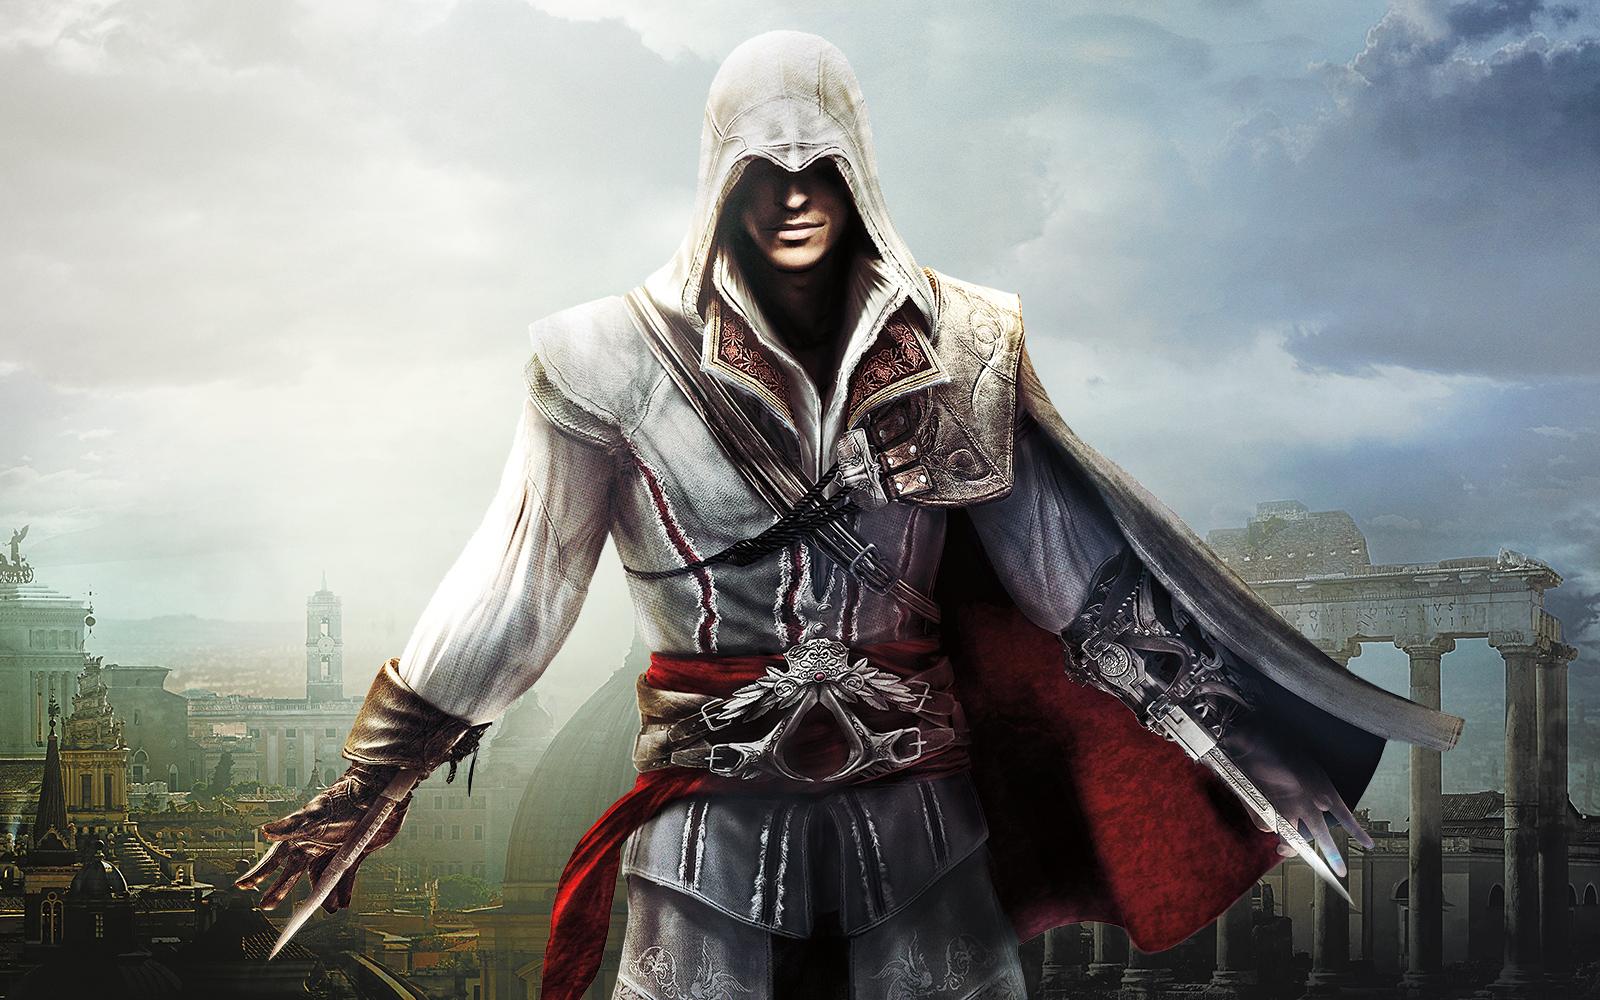 سریال انیمیشنی «کیش یک آدمکش» Assassin's Creed ساخته میشود